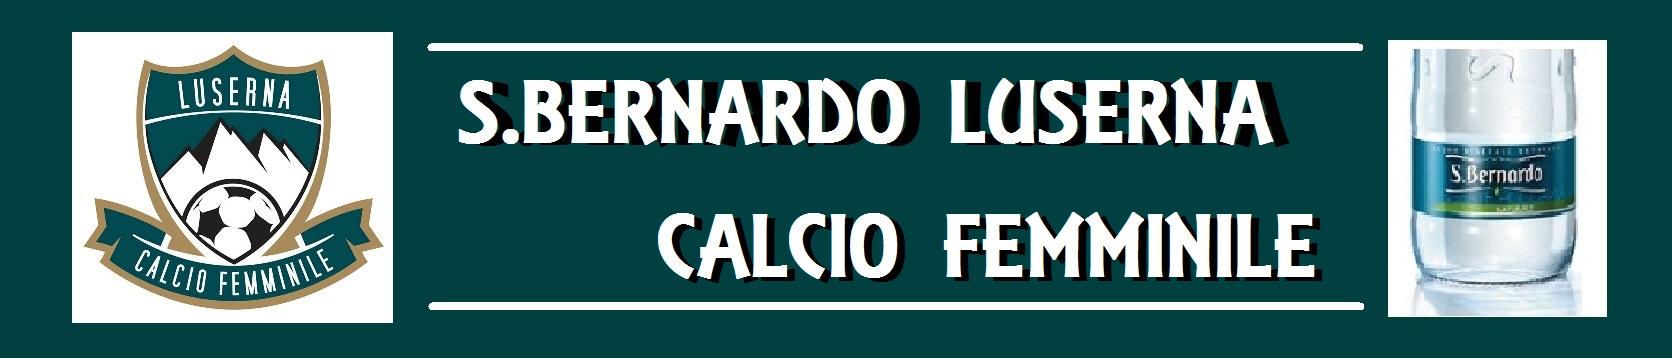 SAN BERNARDO LUSERNA CALCIO FEMMINILE